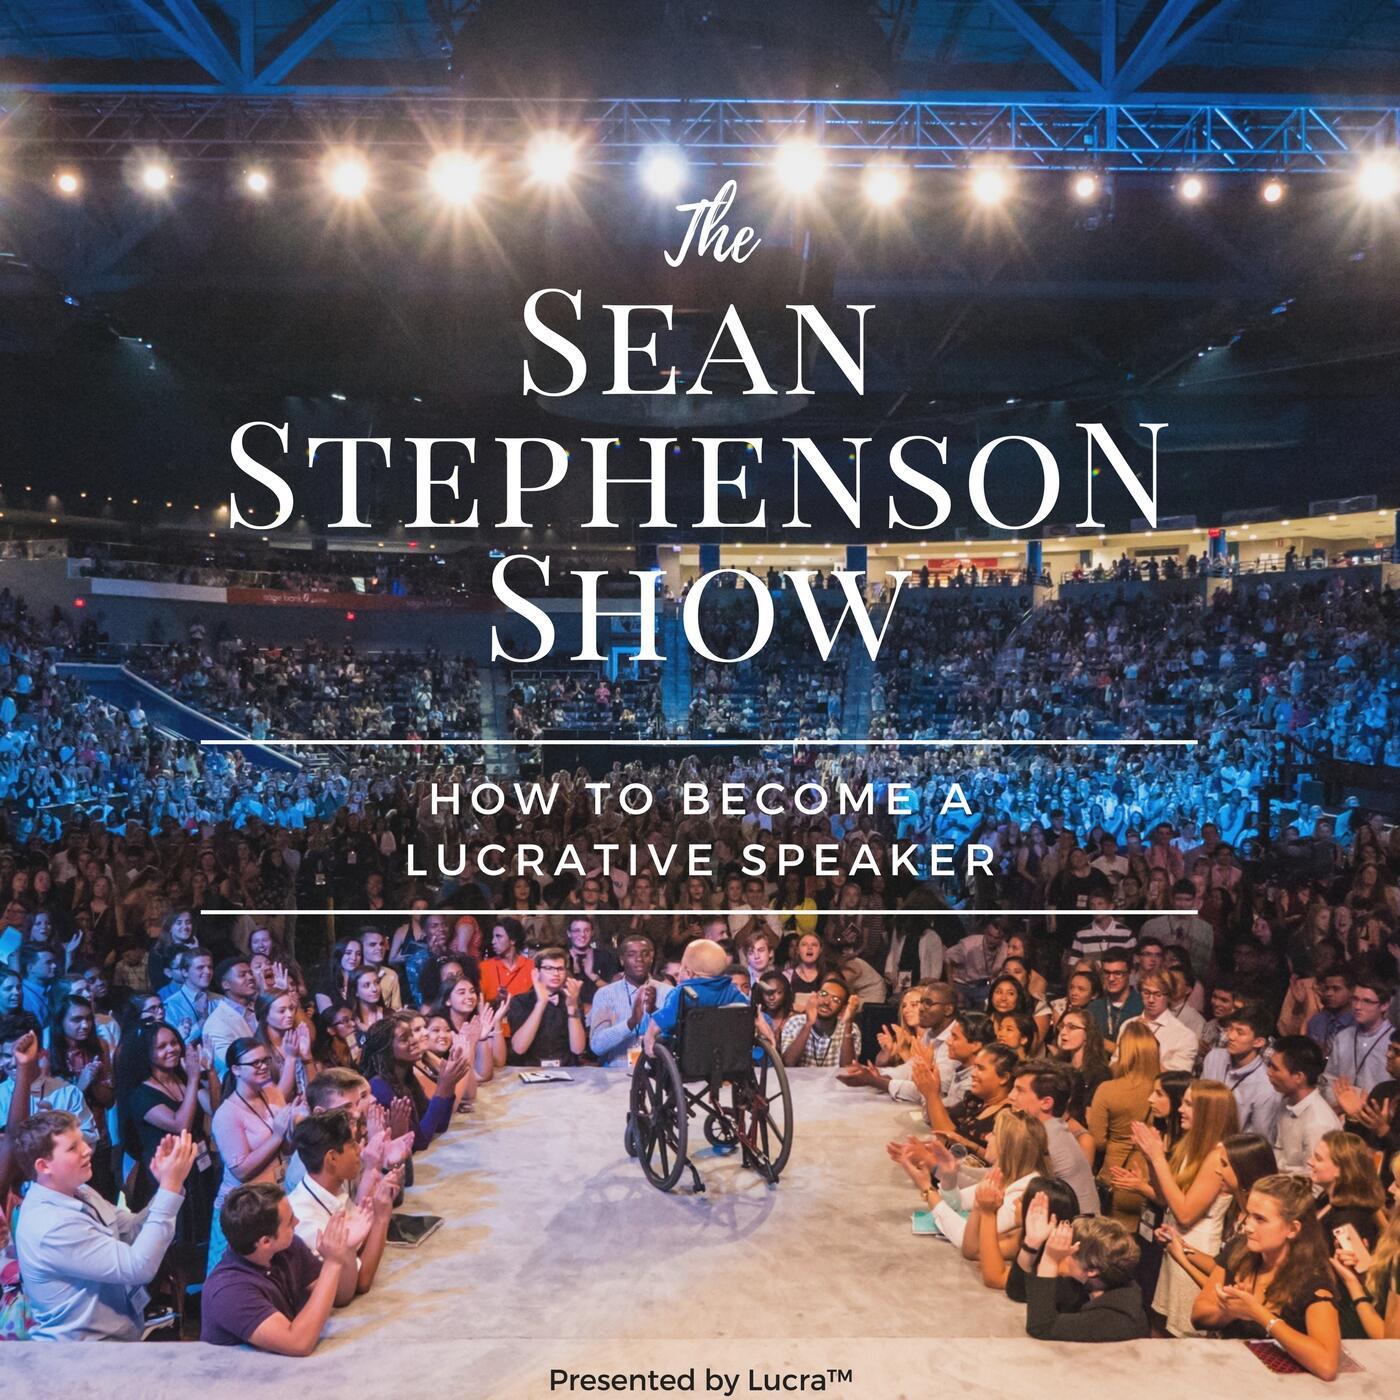 The Sean Stephenson Show